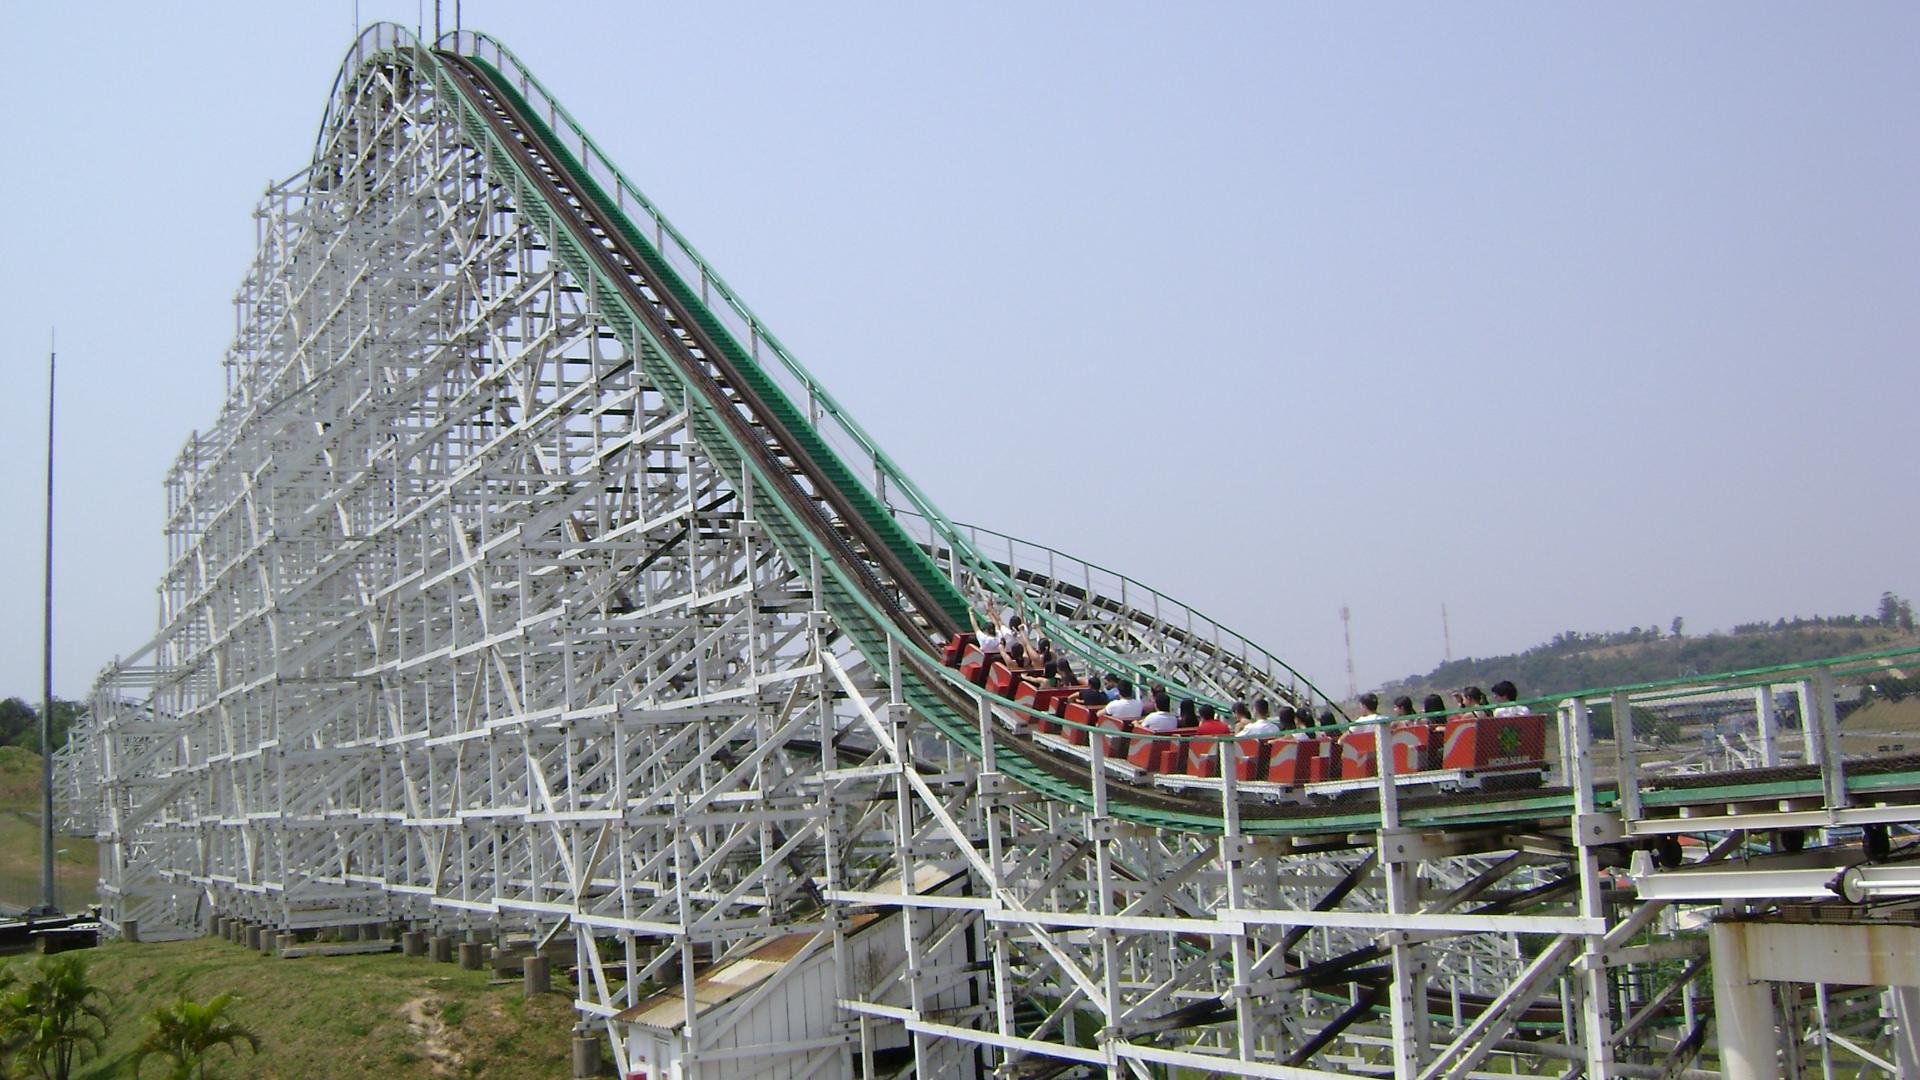 roller coaster creators